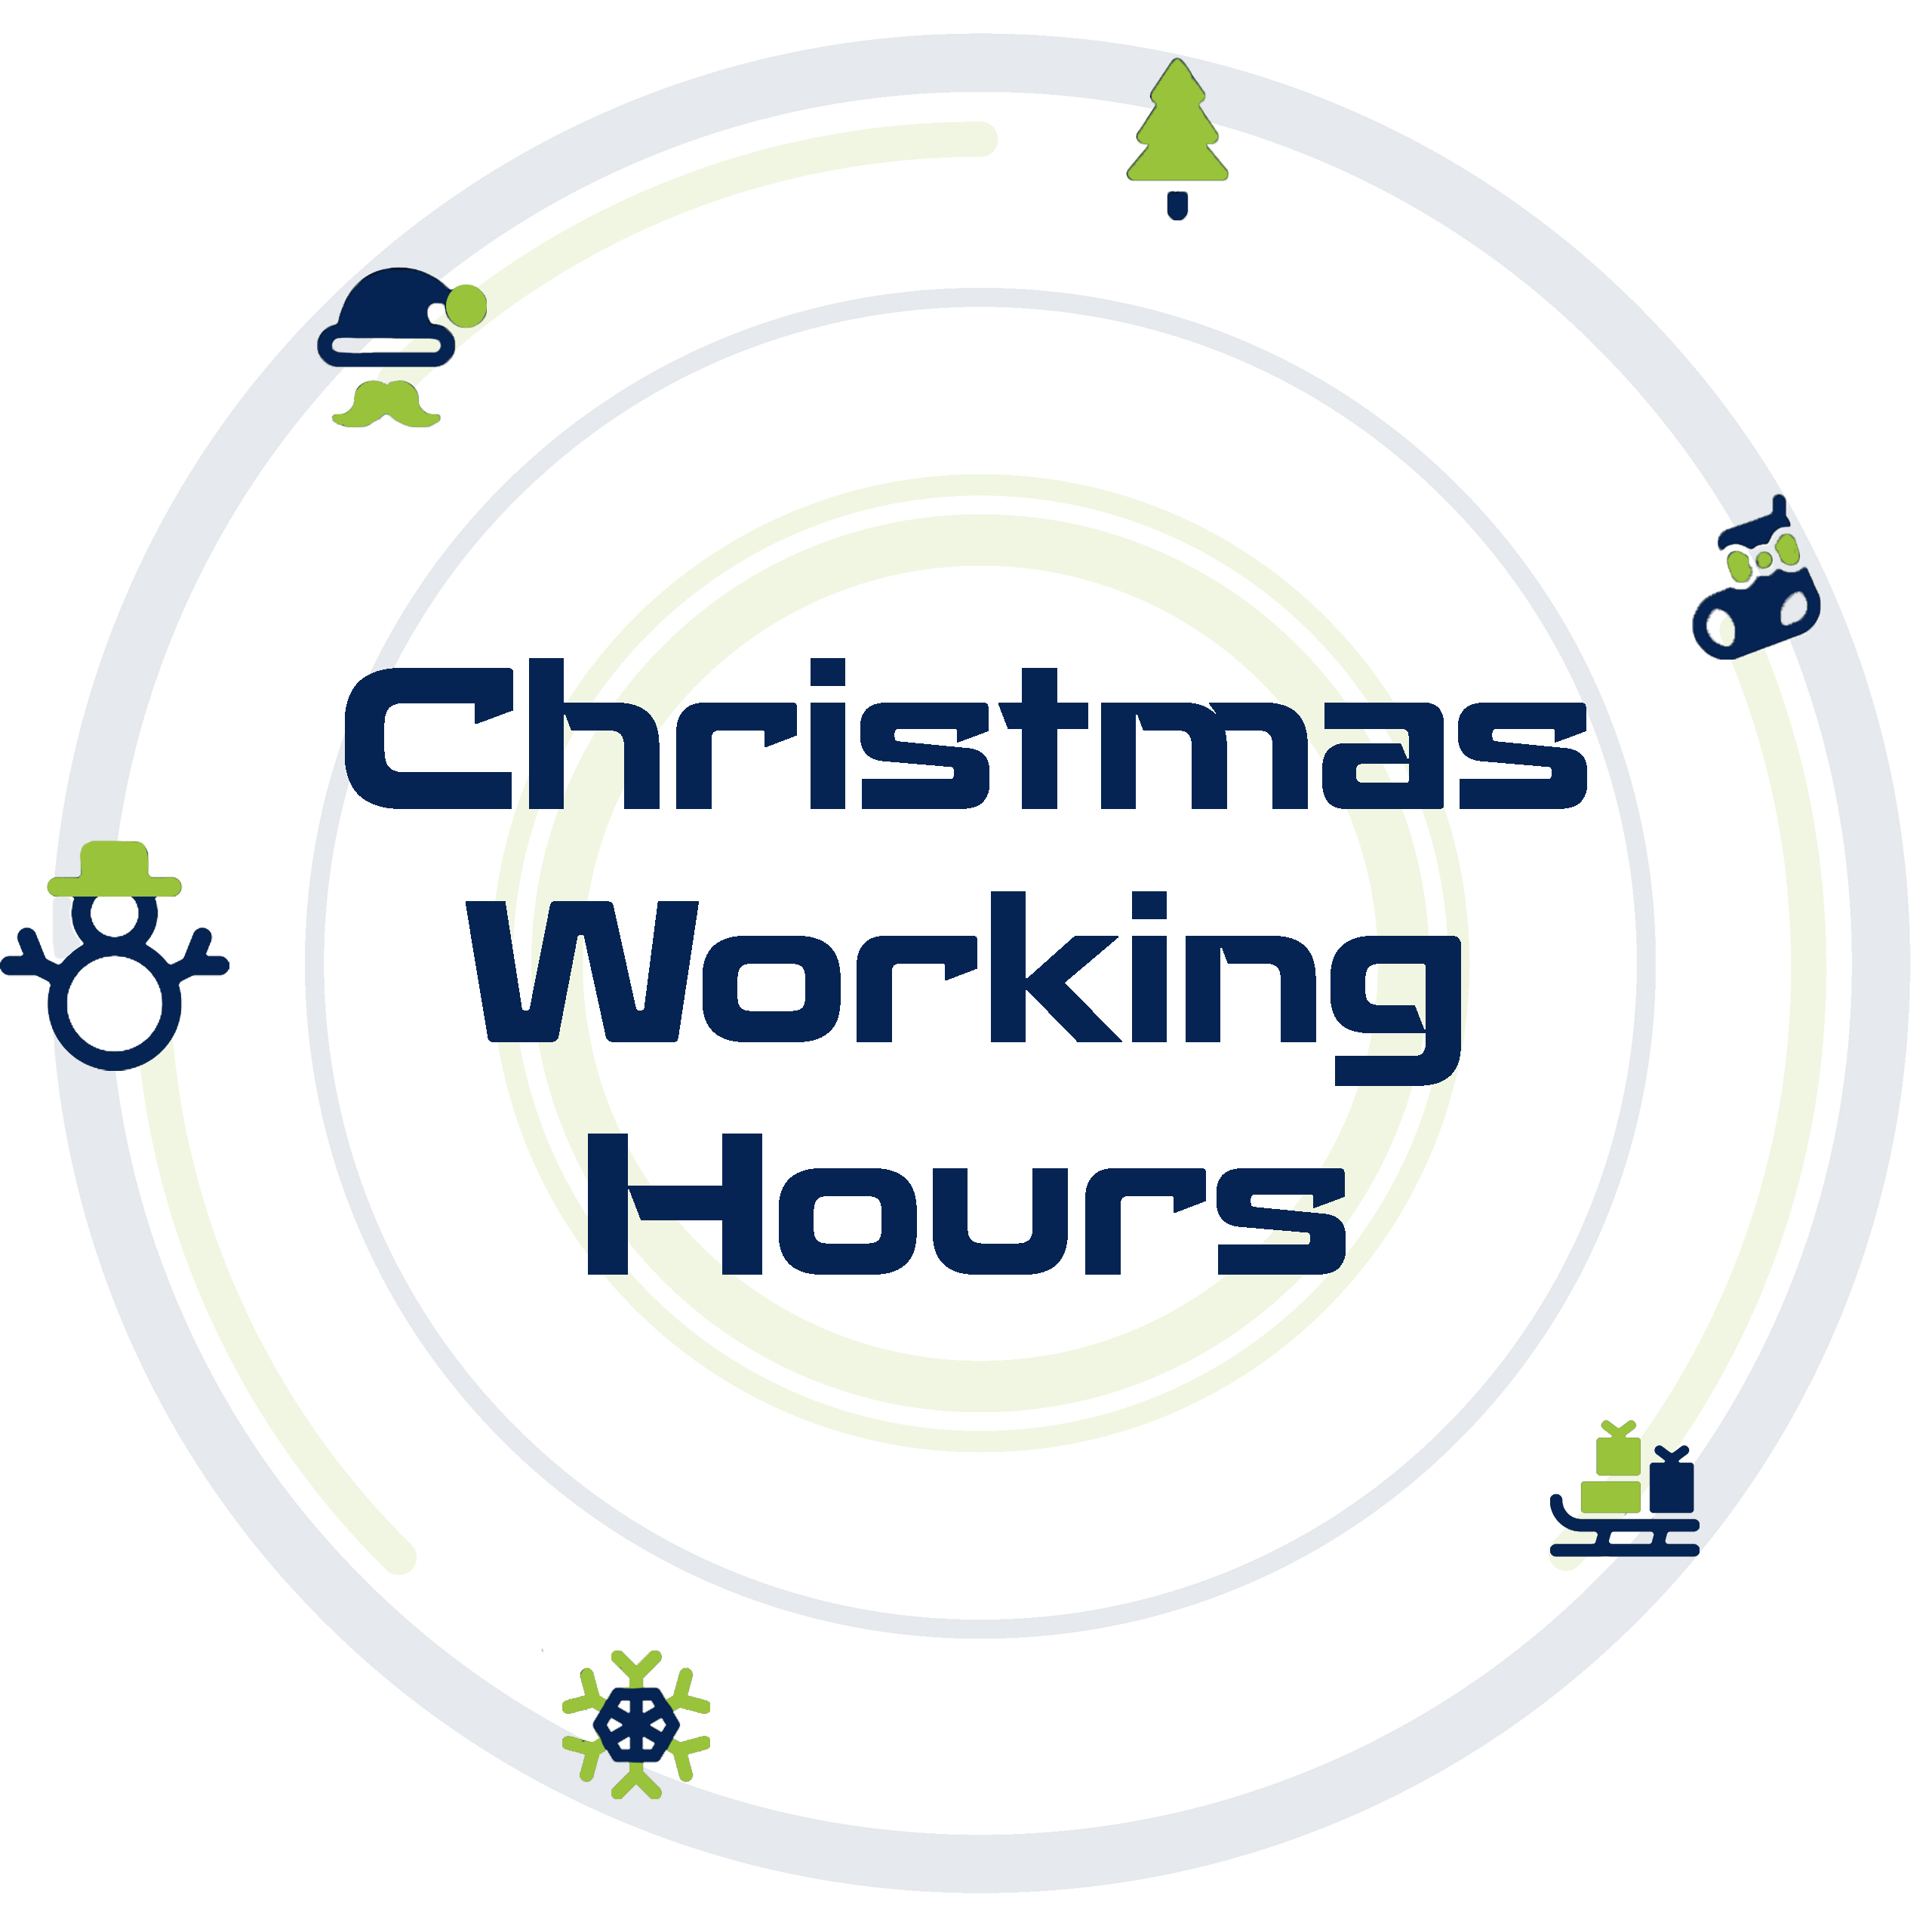 2020 Christmas Working Hours image